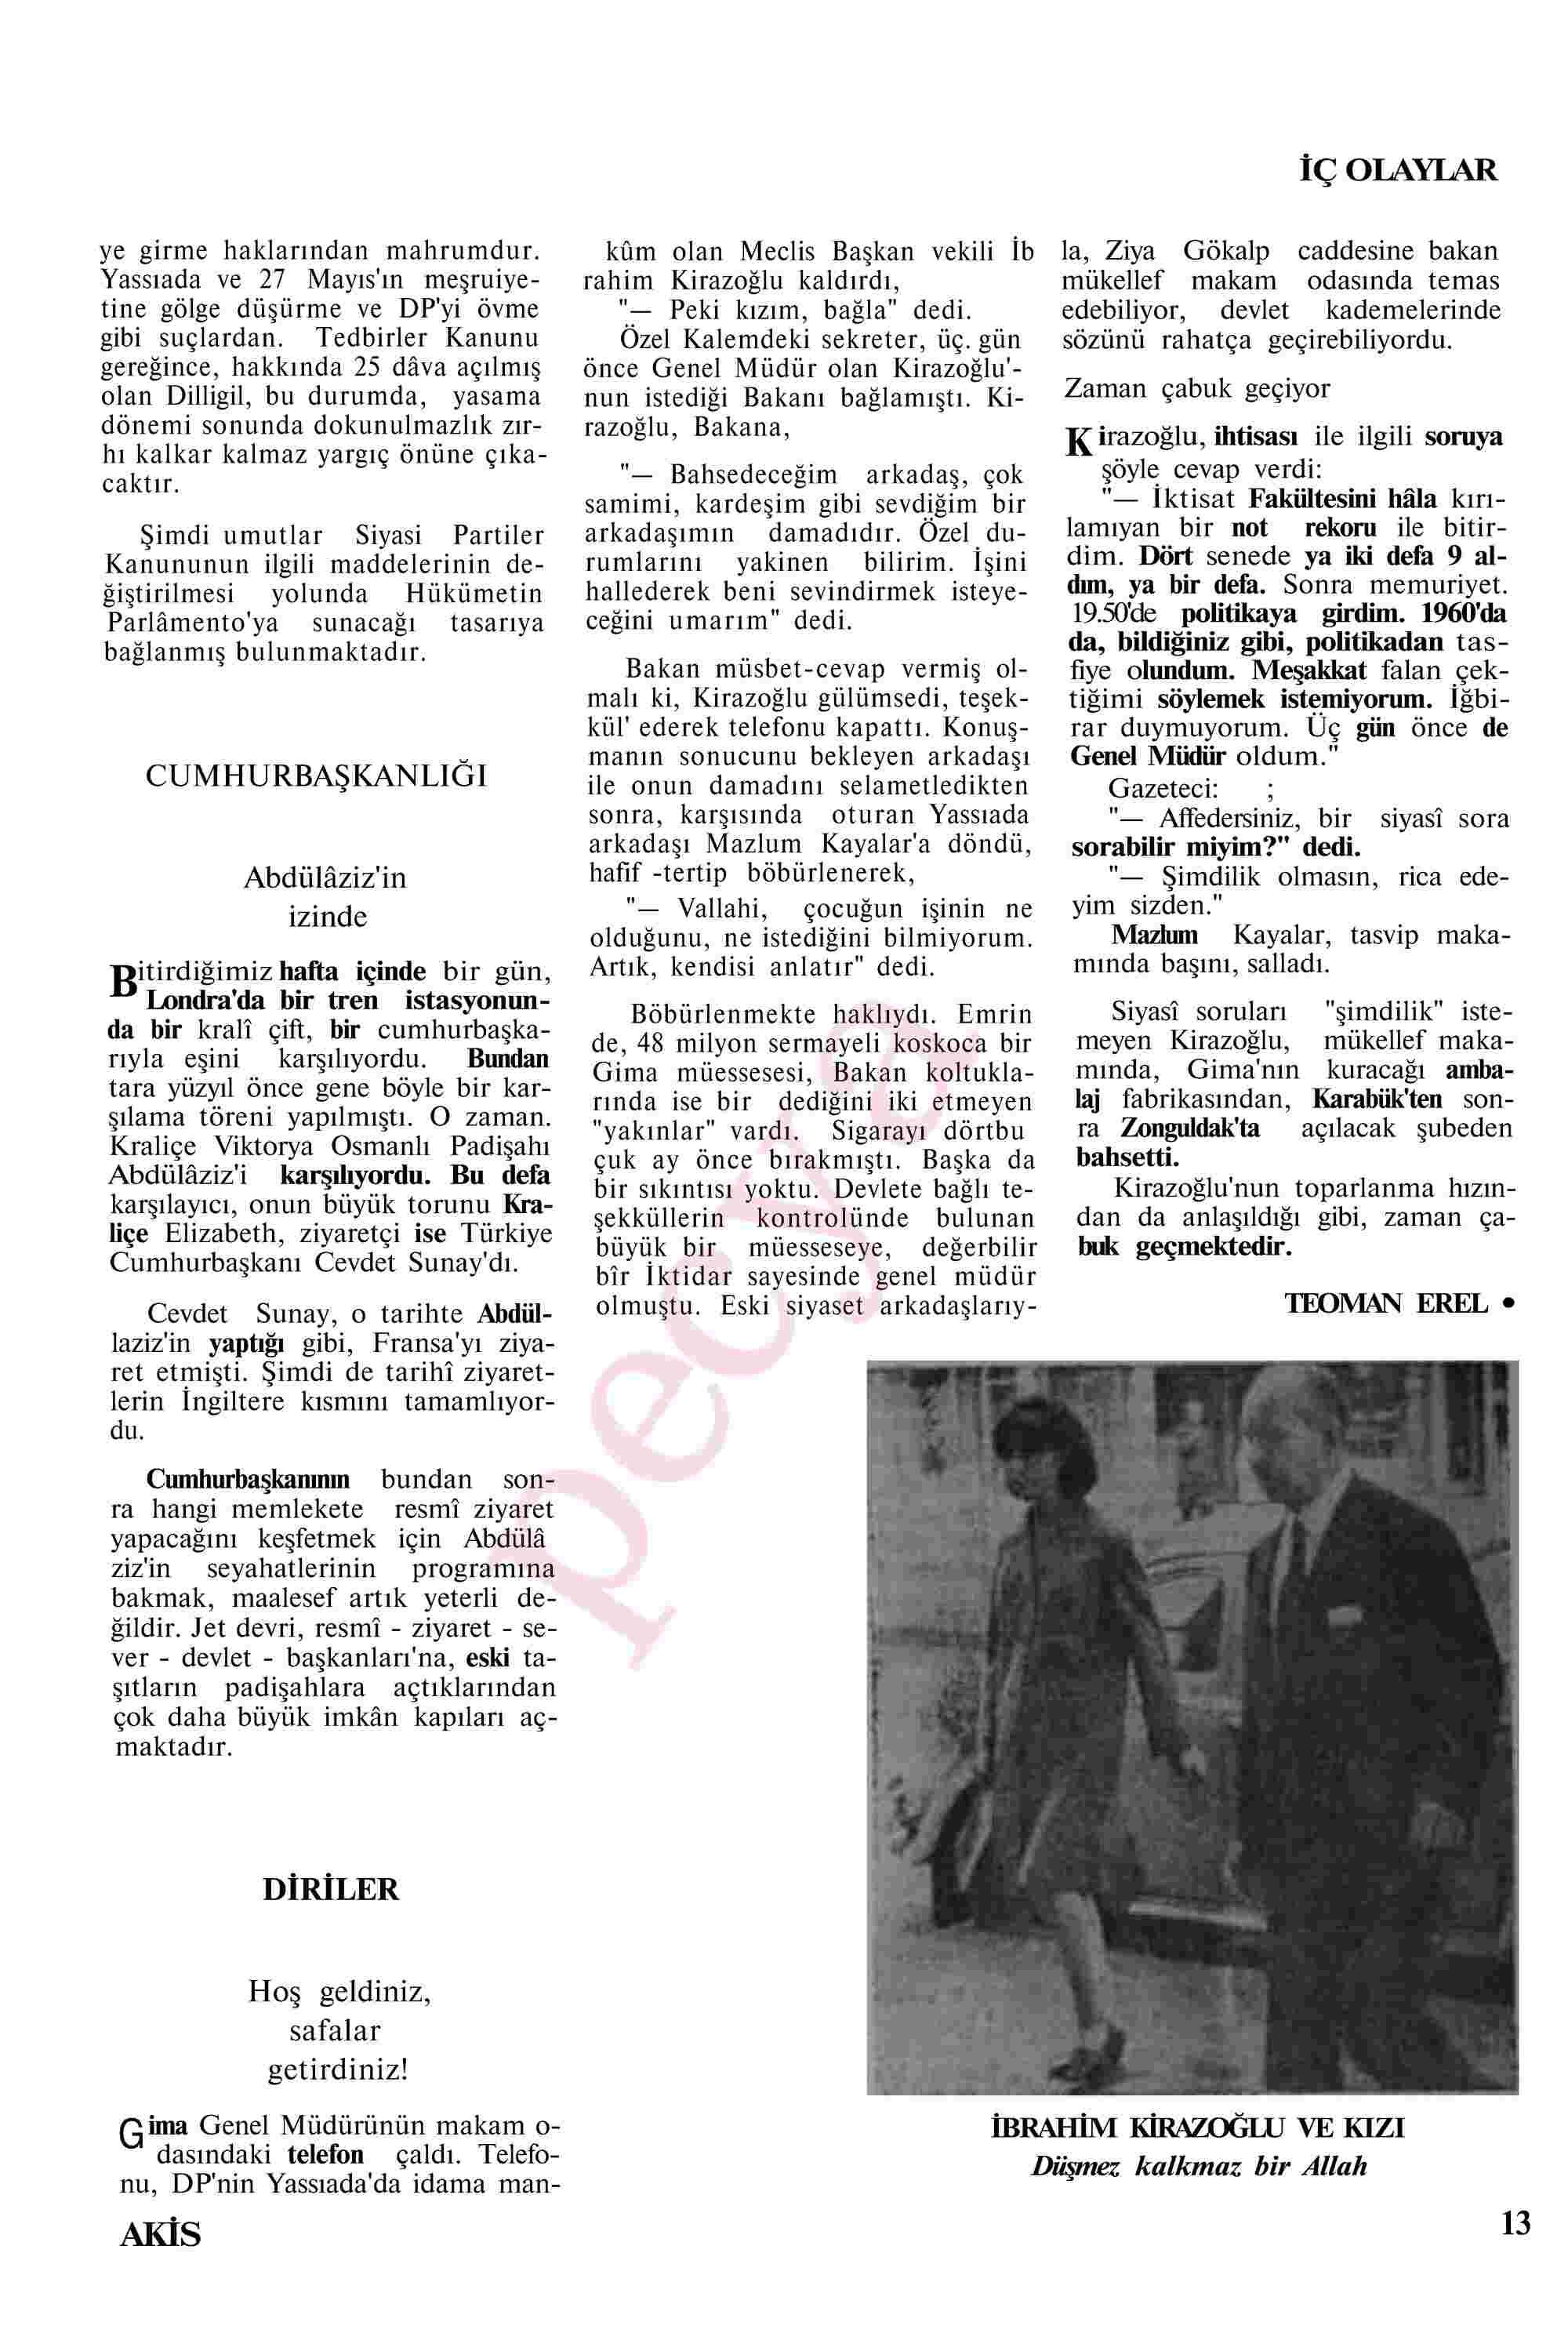 November 6, 1967 Tarihli Akis Dergisi Sayfa 13